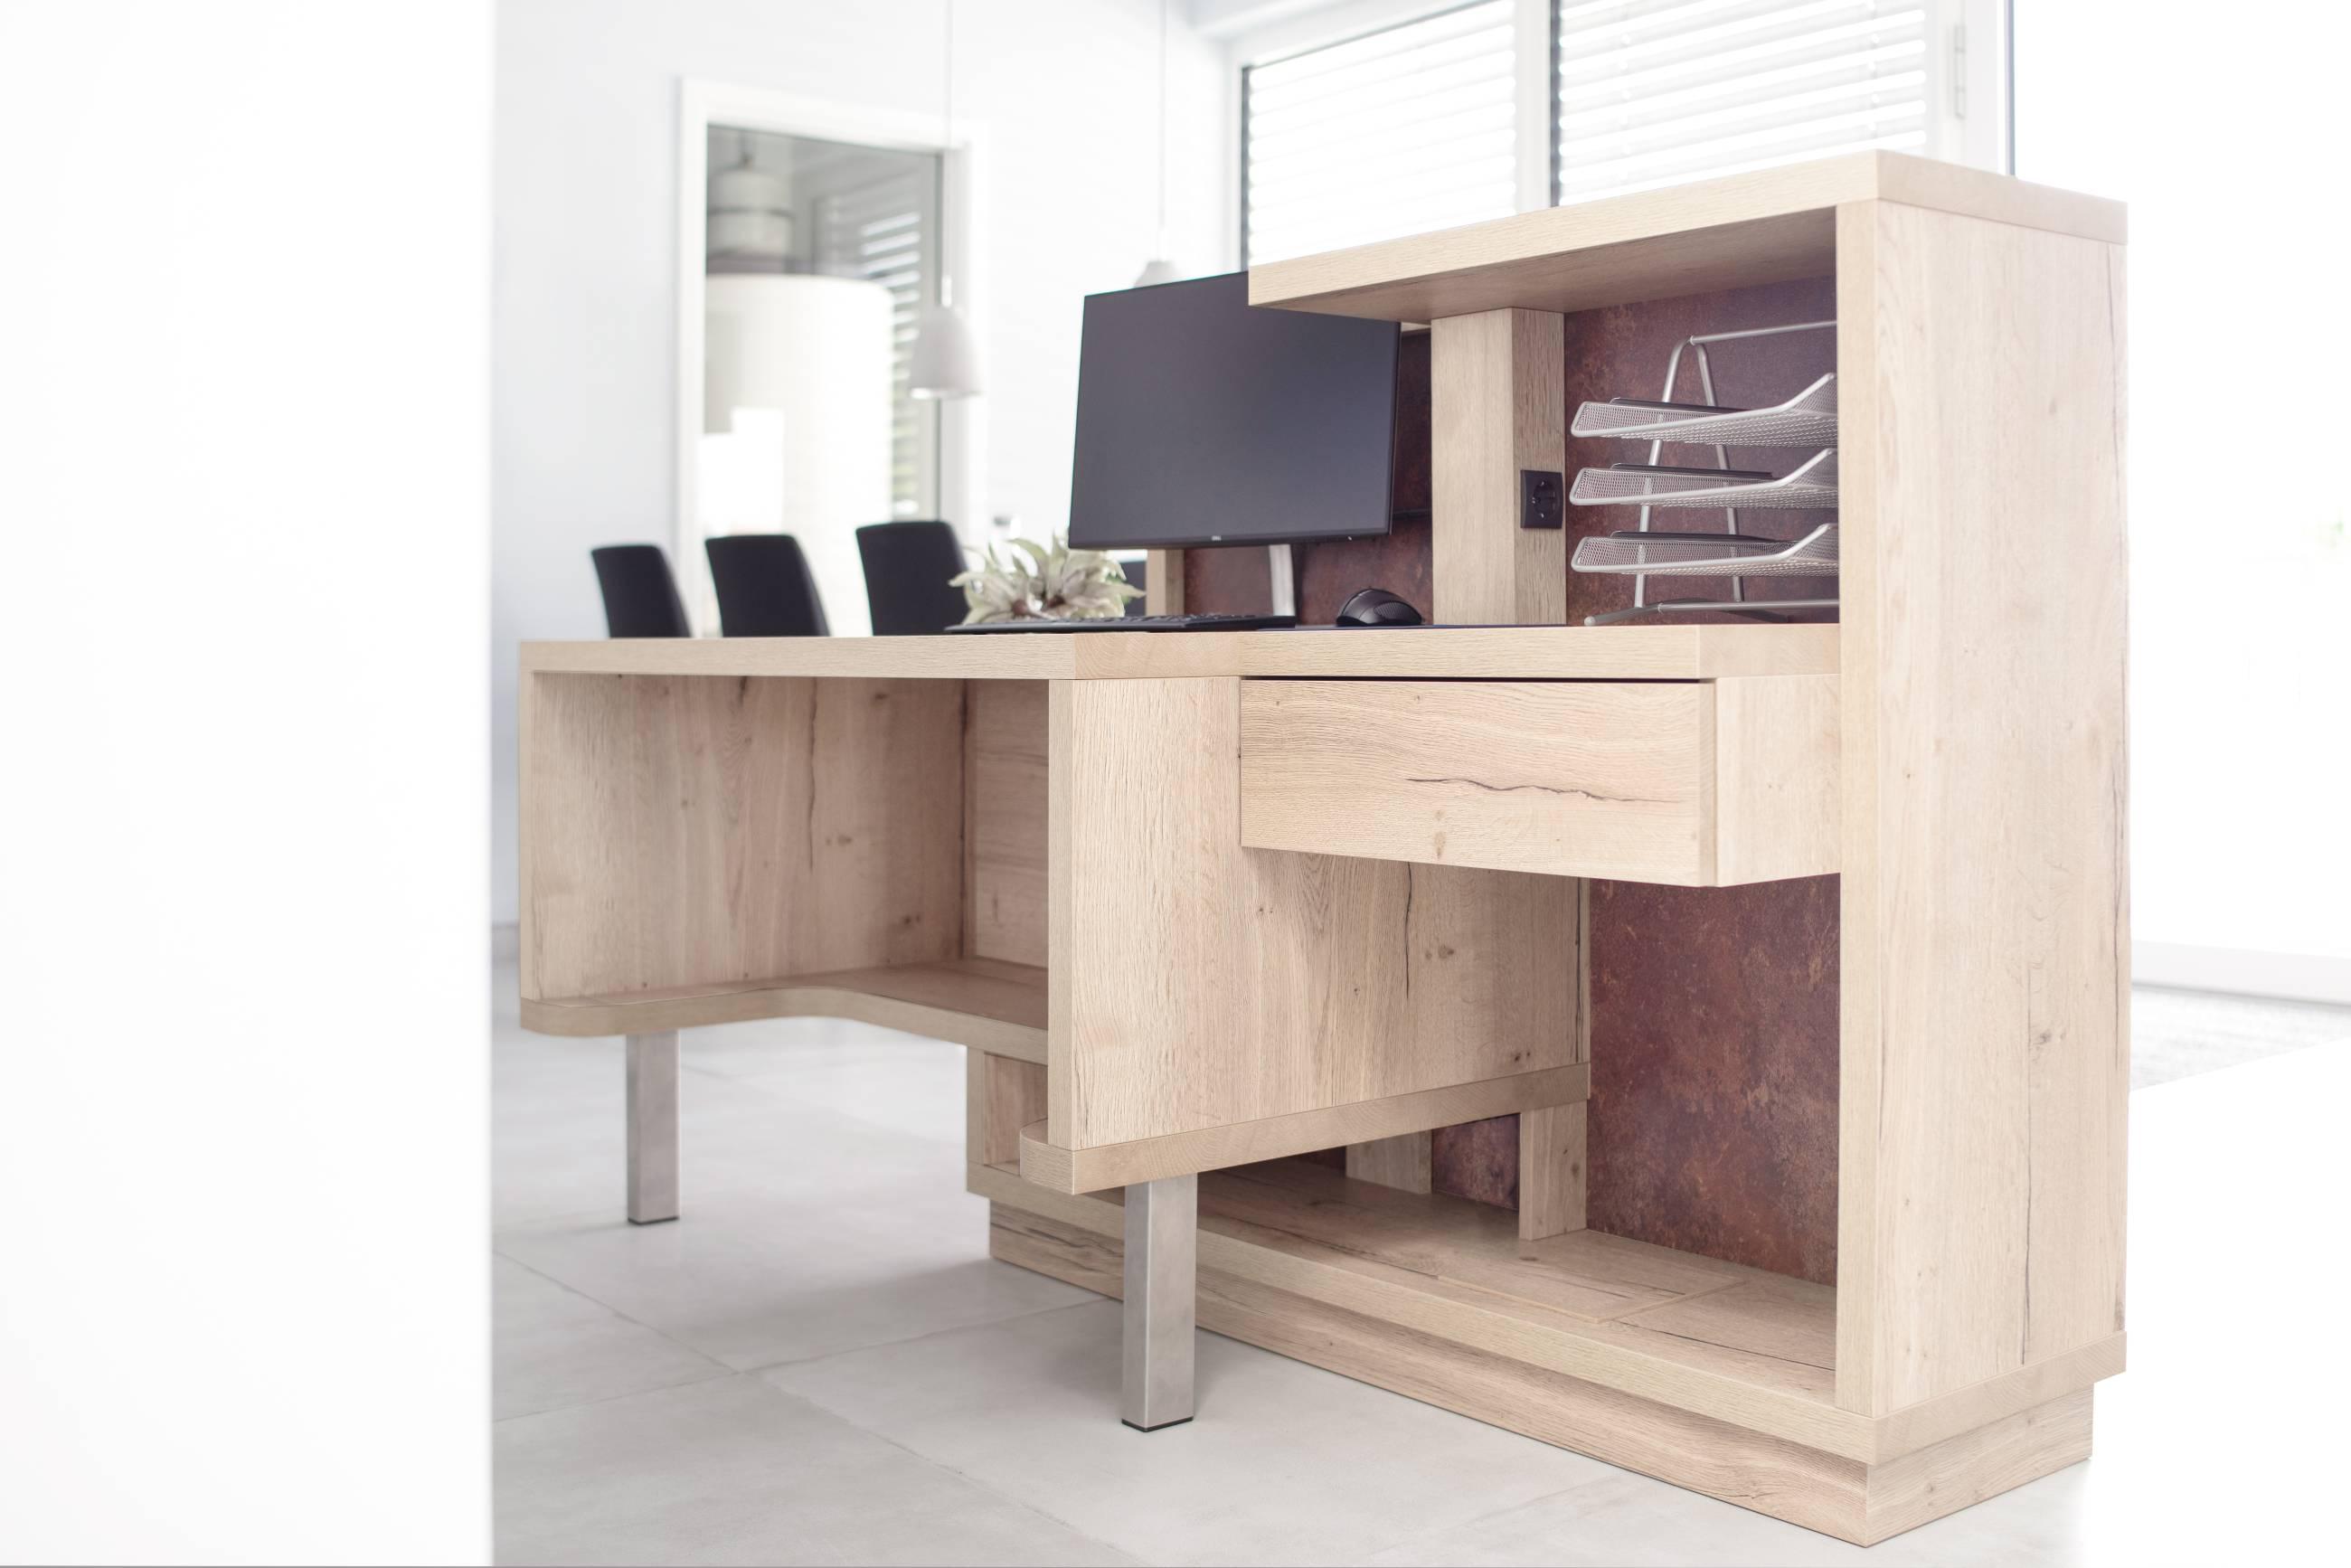 moebel-for-you.de Empfangstresen mit integriertem Schreibtisch